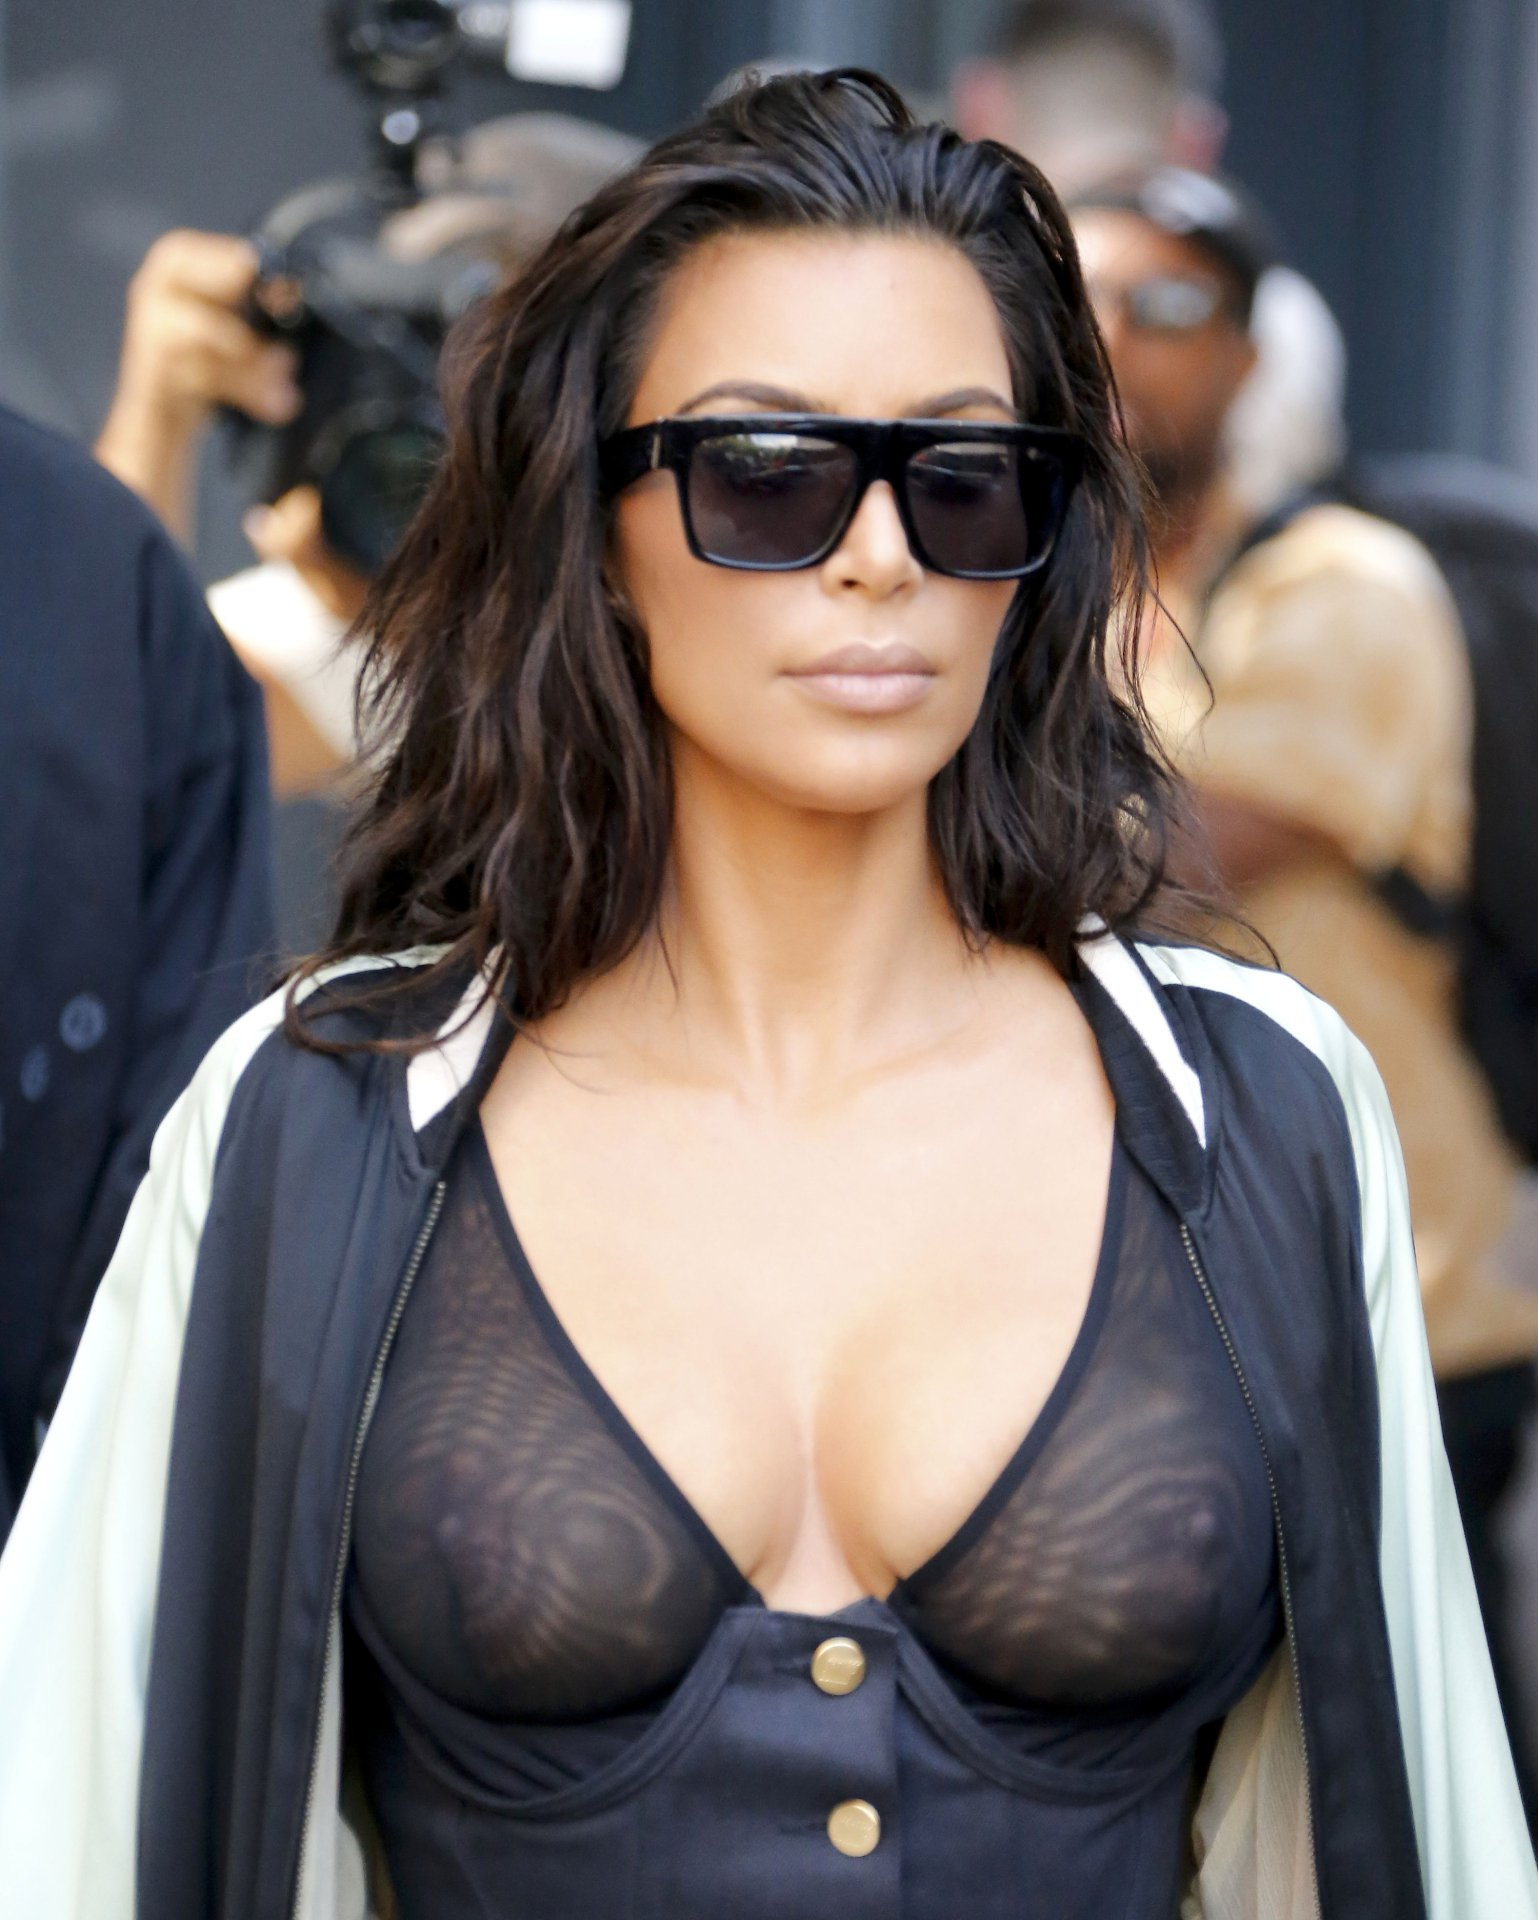 Kims sex tape